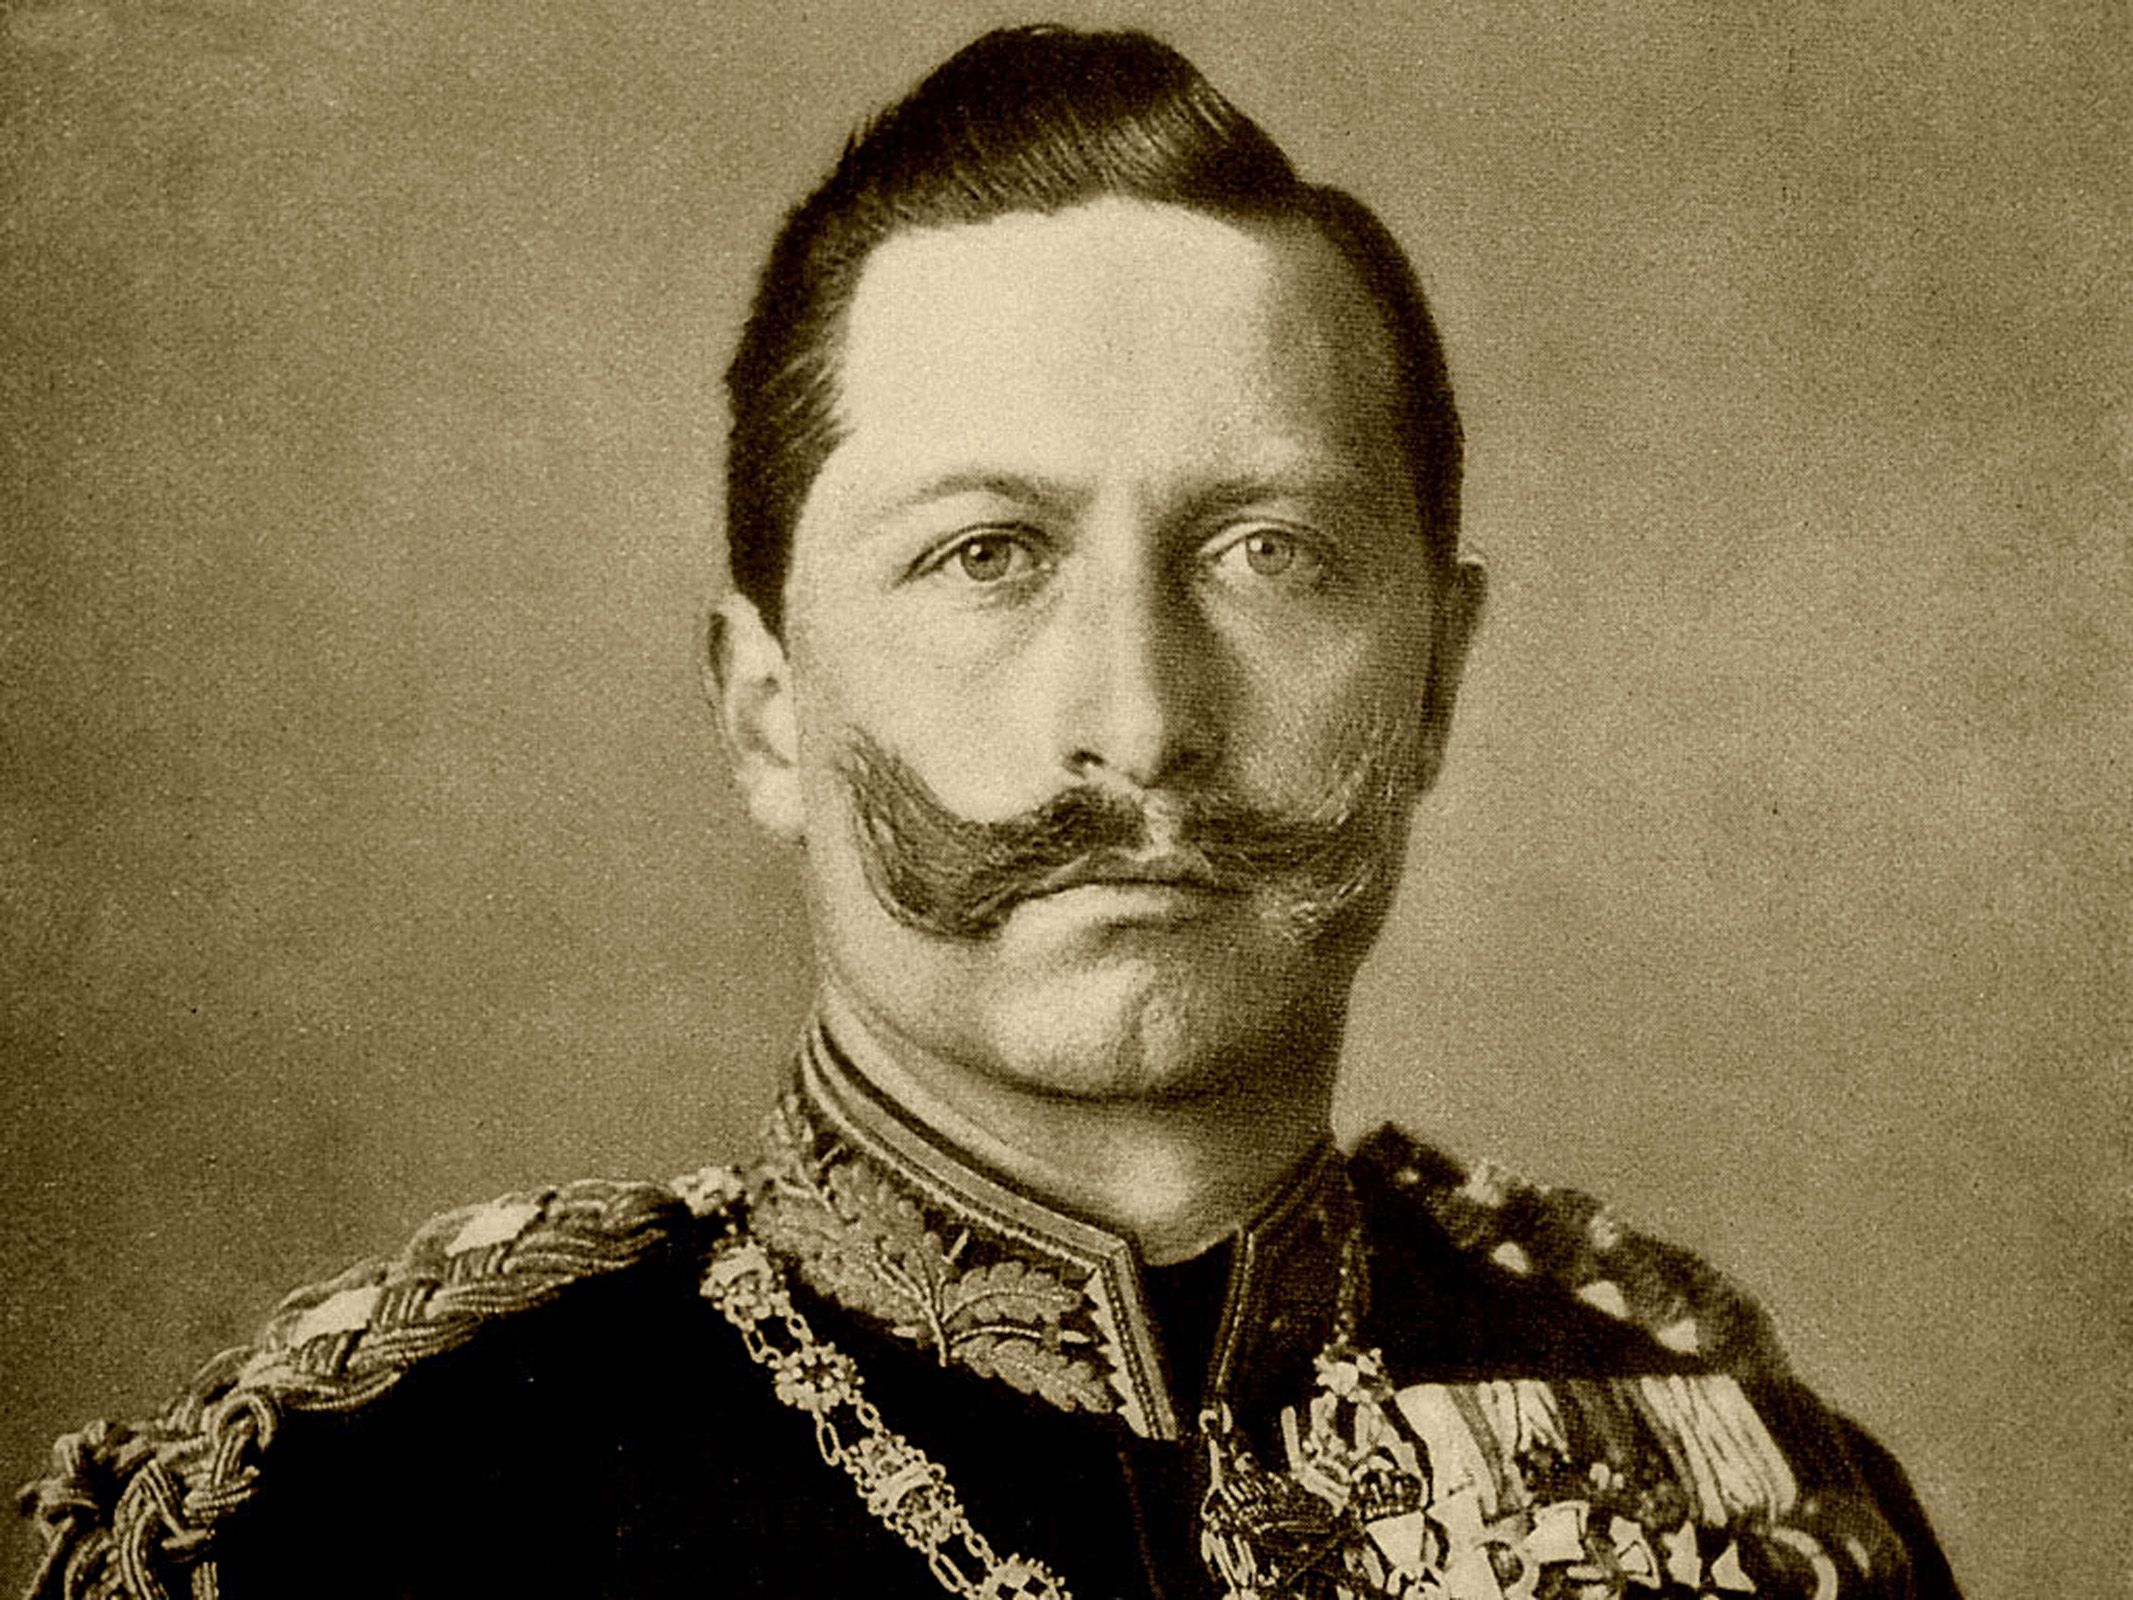 kaiser wilhelm ii was the successor of otto von bismarck his rule was between 1888